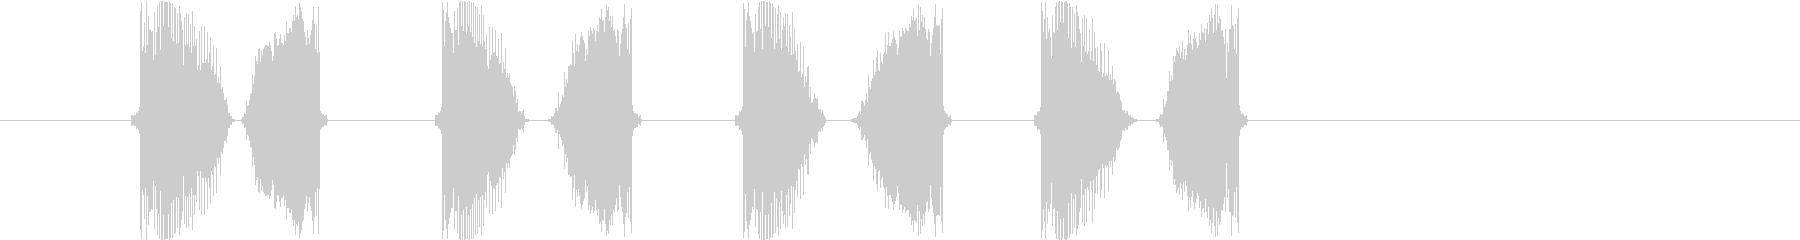 DJスクラッチ5slow(チュキチュキ)の未再生の波形